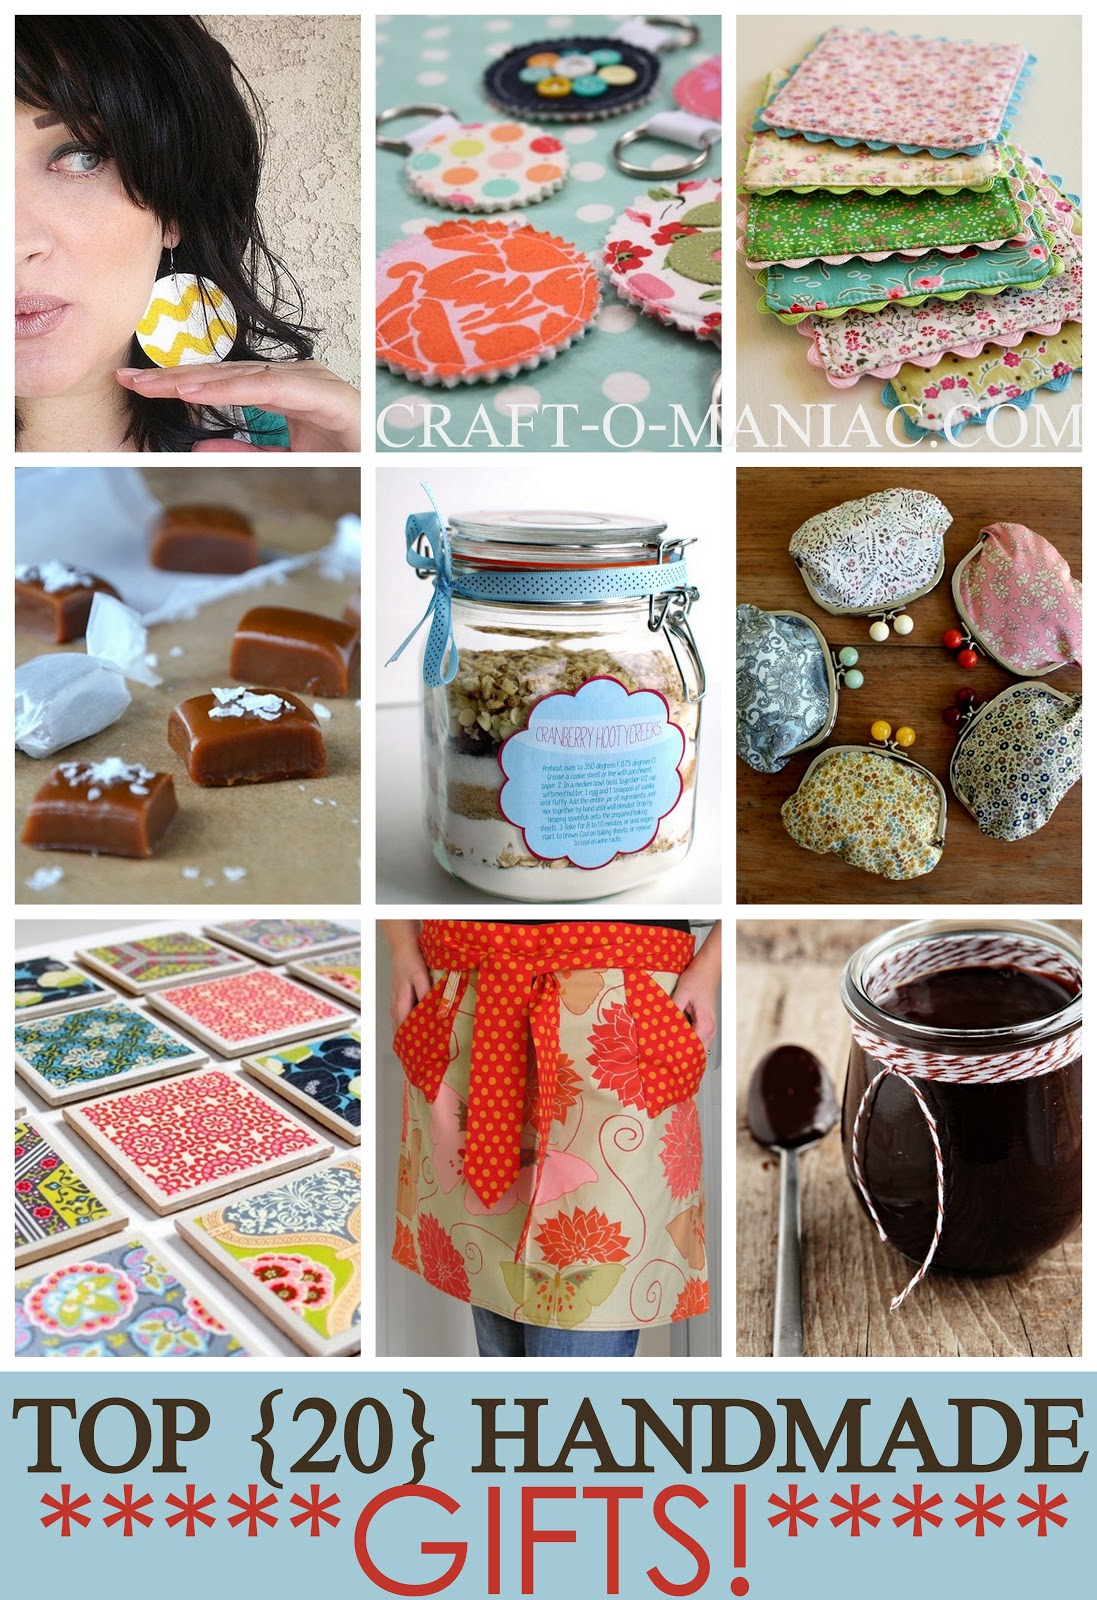 Top 20 Handmade Gifts